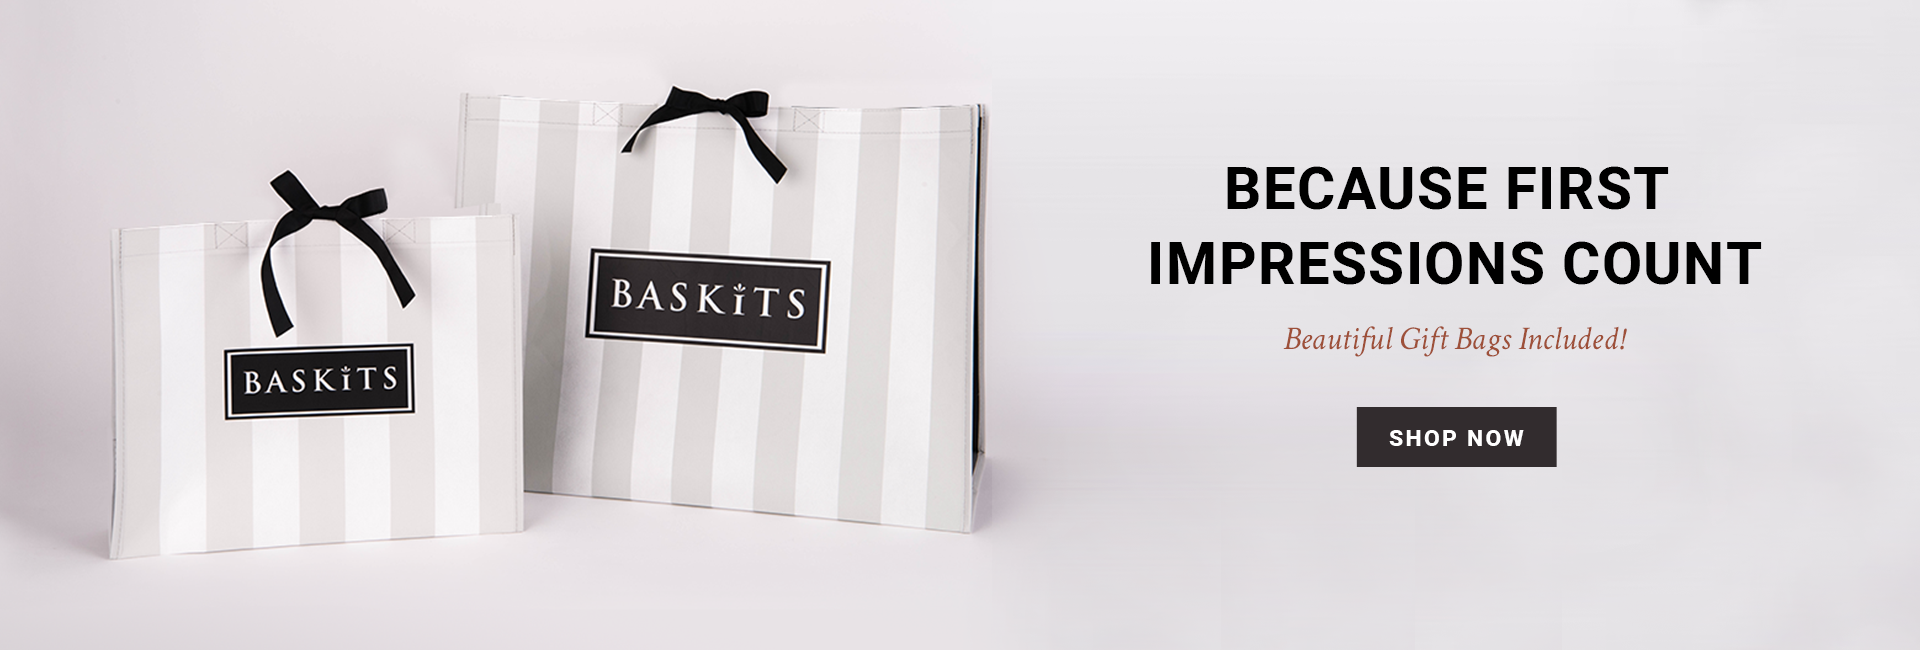 Baskits - Purveyors of Fine Gifts